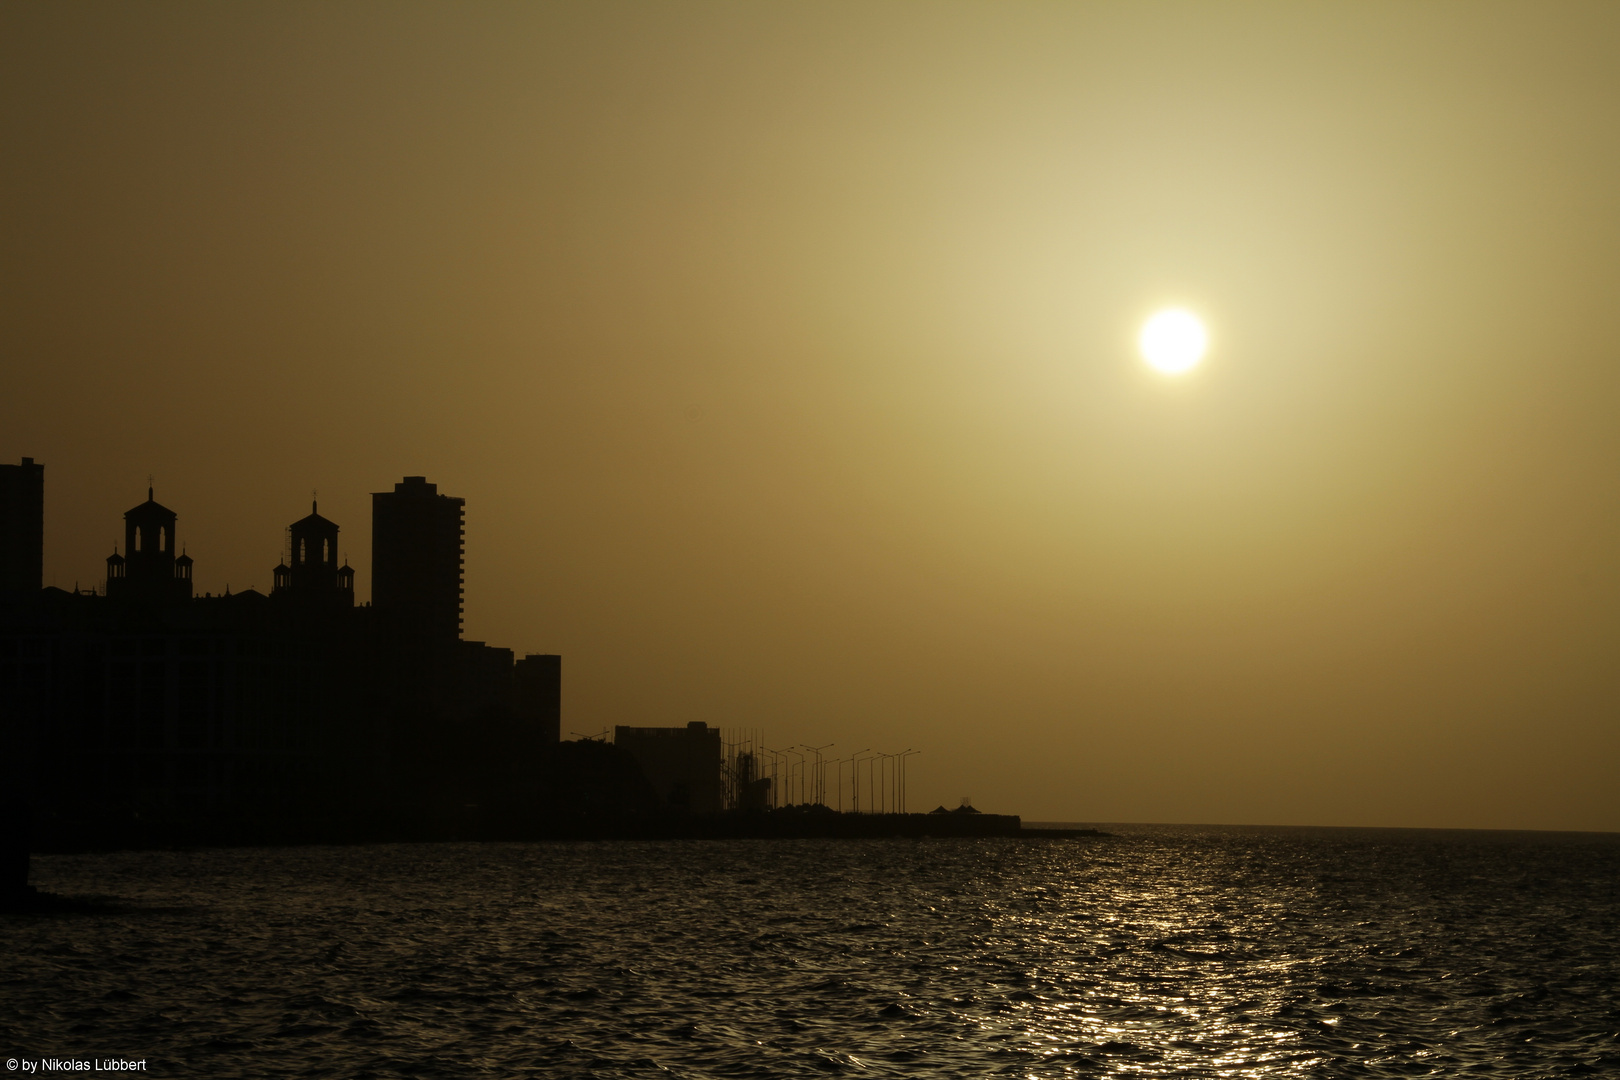 Sonnenuntergang #3